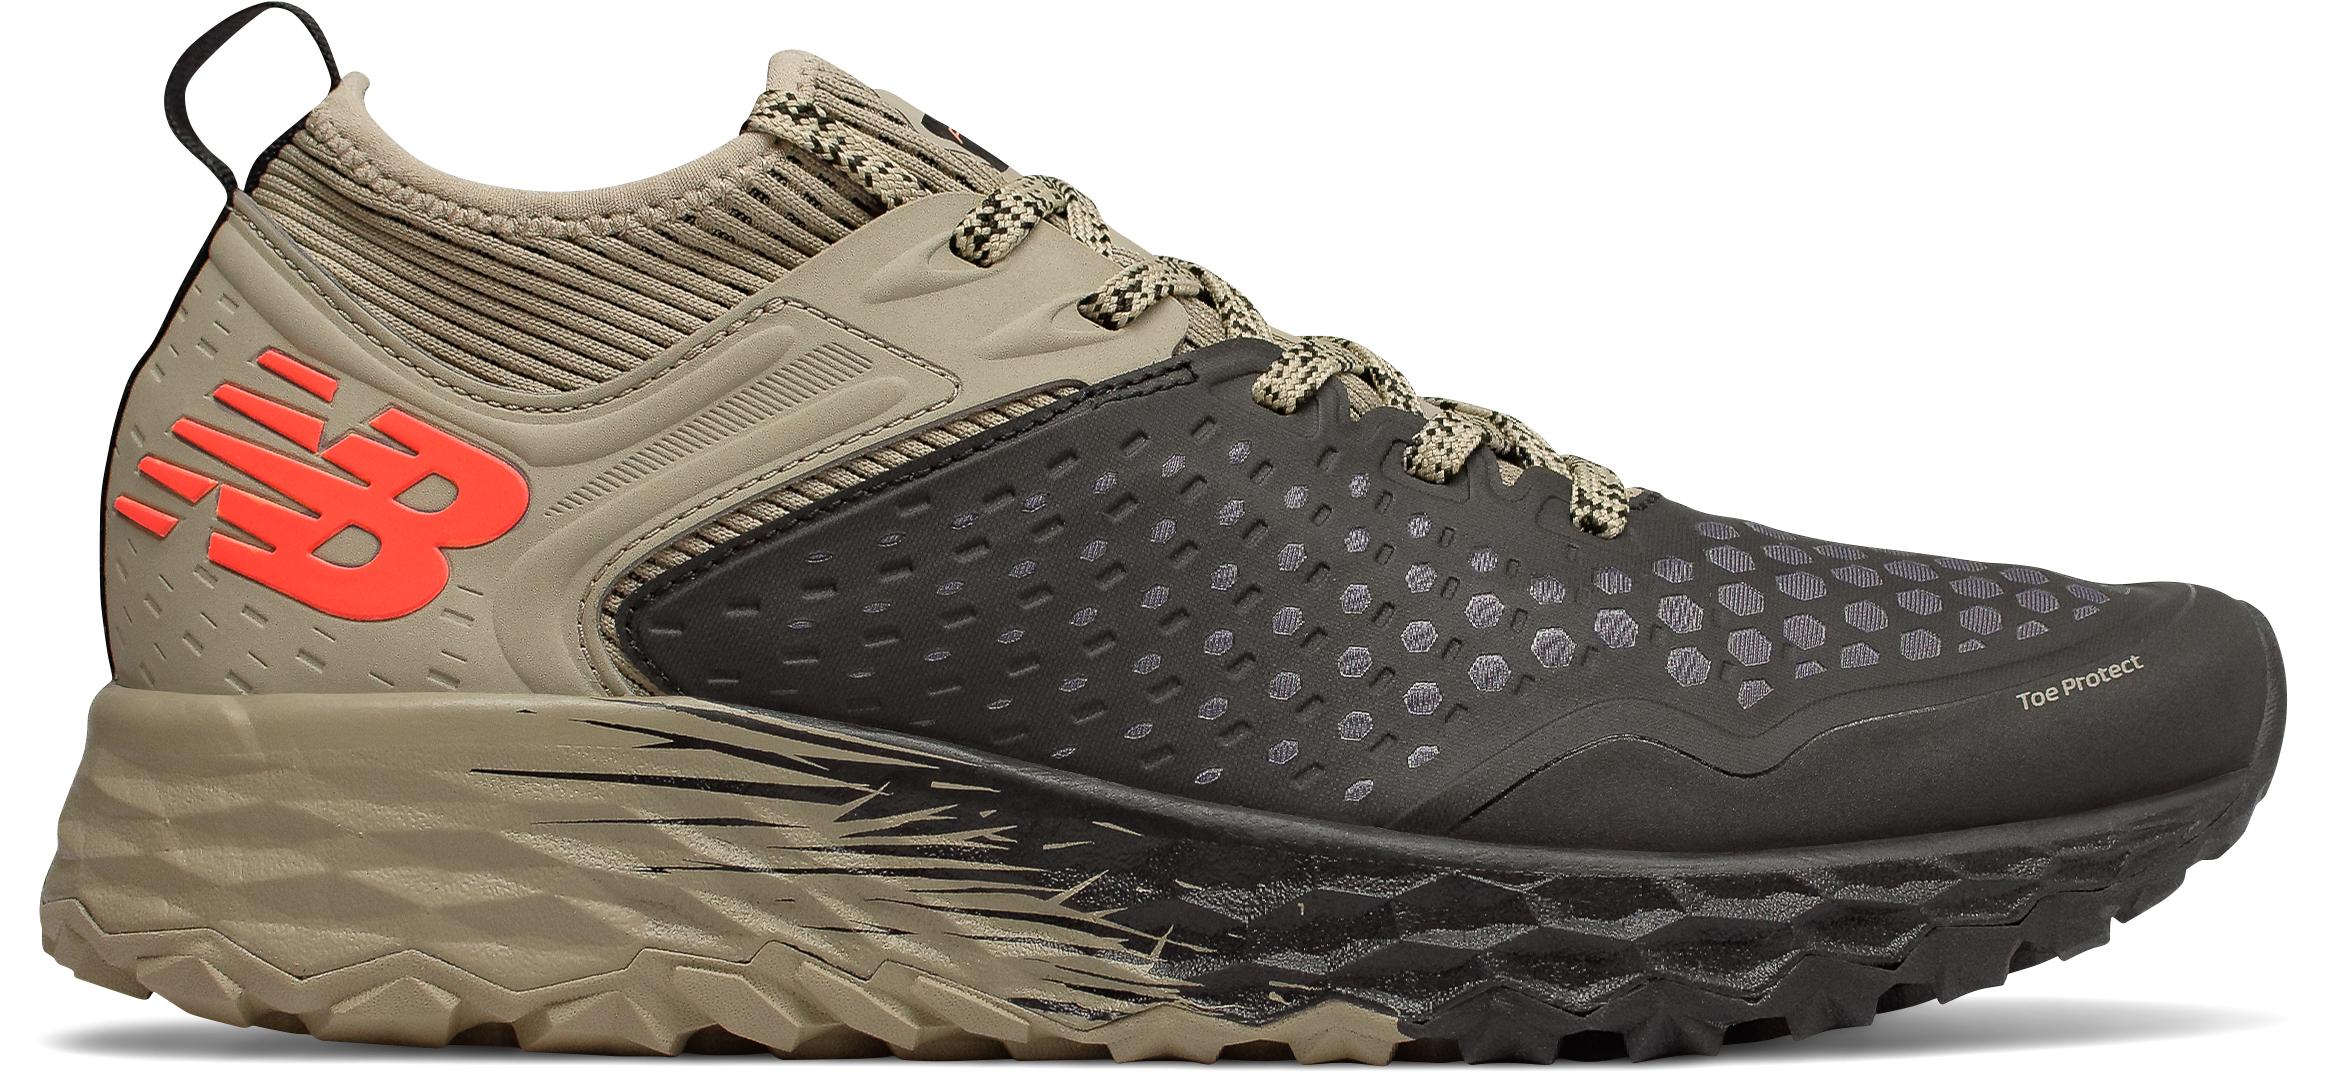 Hierro De Chaussures Hommes V4 New Sur Foam Sentier Course Balance Fresh OPXiwZkuT